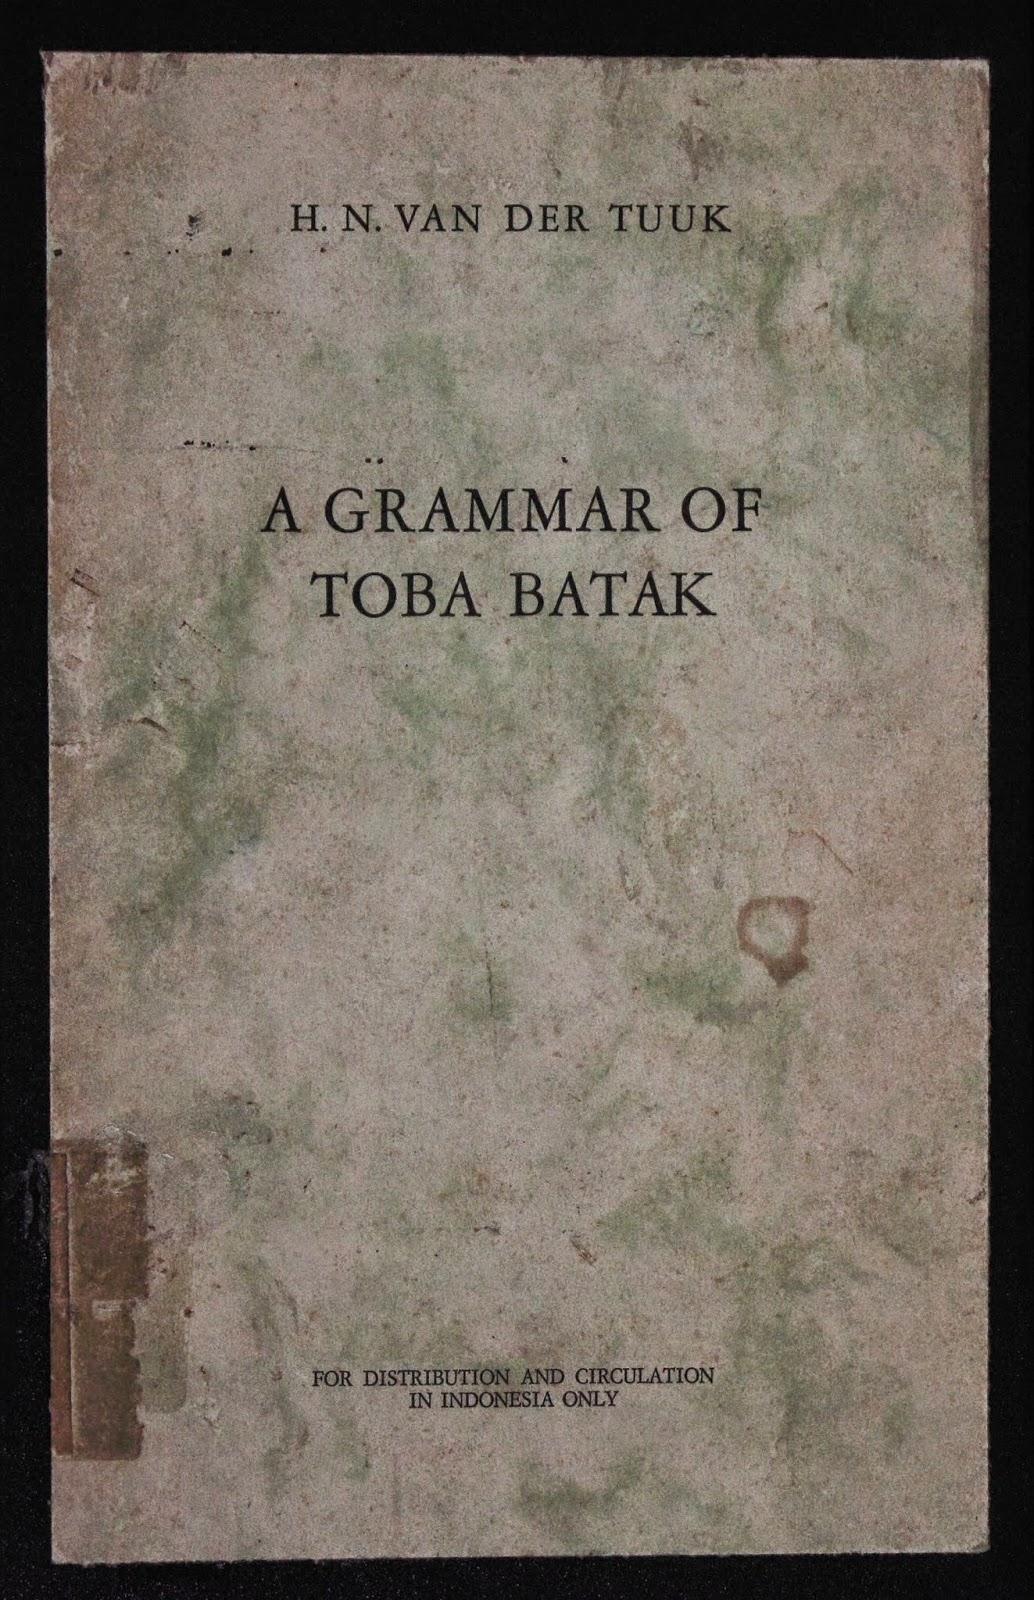 http://opac.pnri.go.id/DetaliListOpac.aspx?pDataItem=a+grammar+of+toba+batak&pType=Title&pLembarkerja=-1